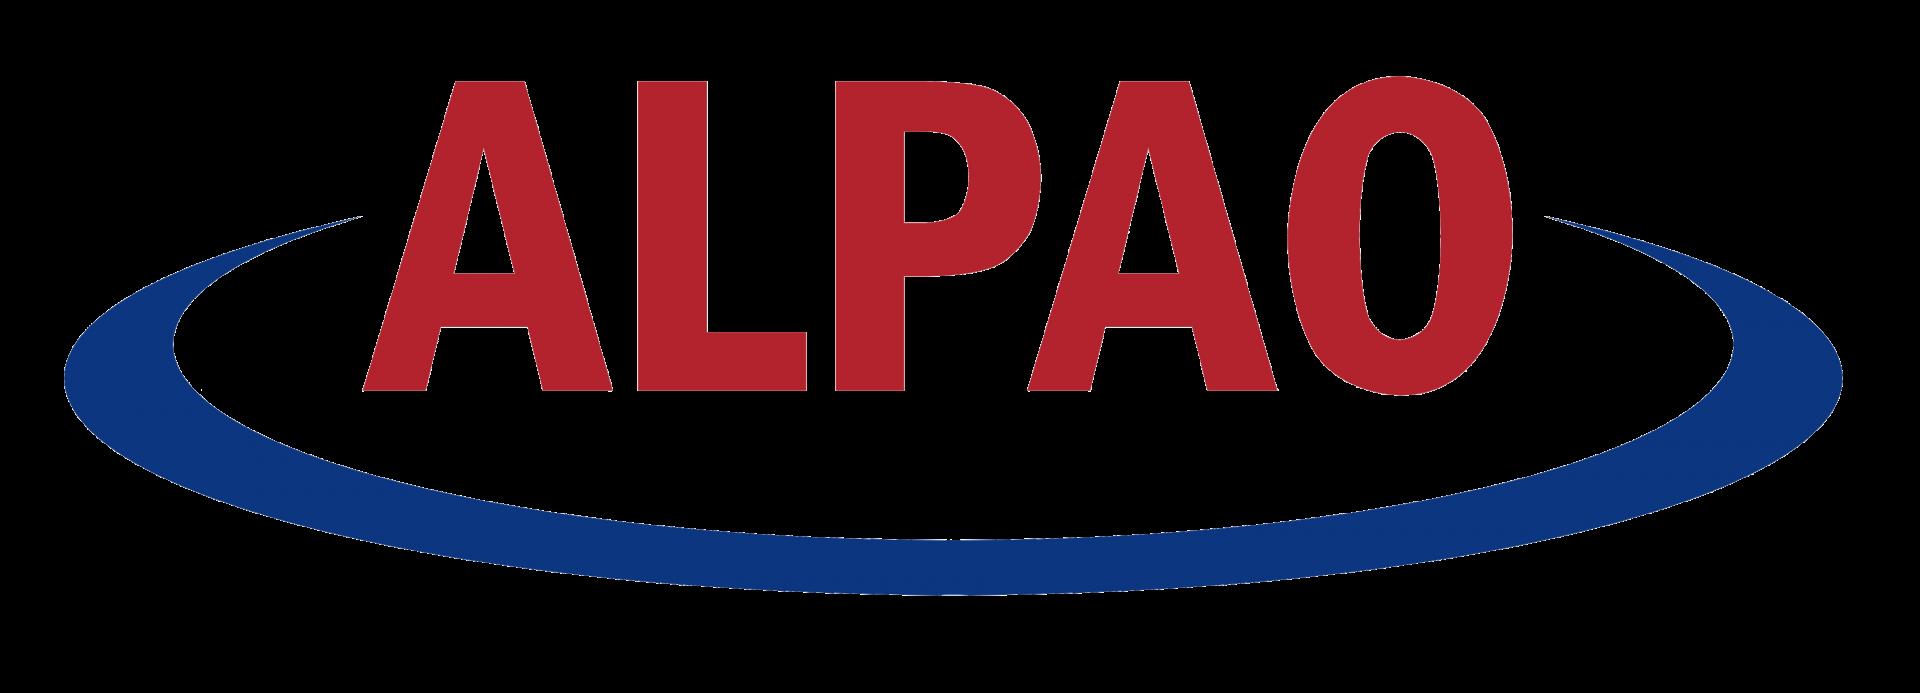 Alpao logo transp fait